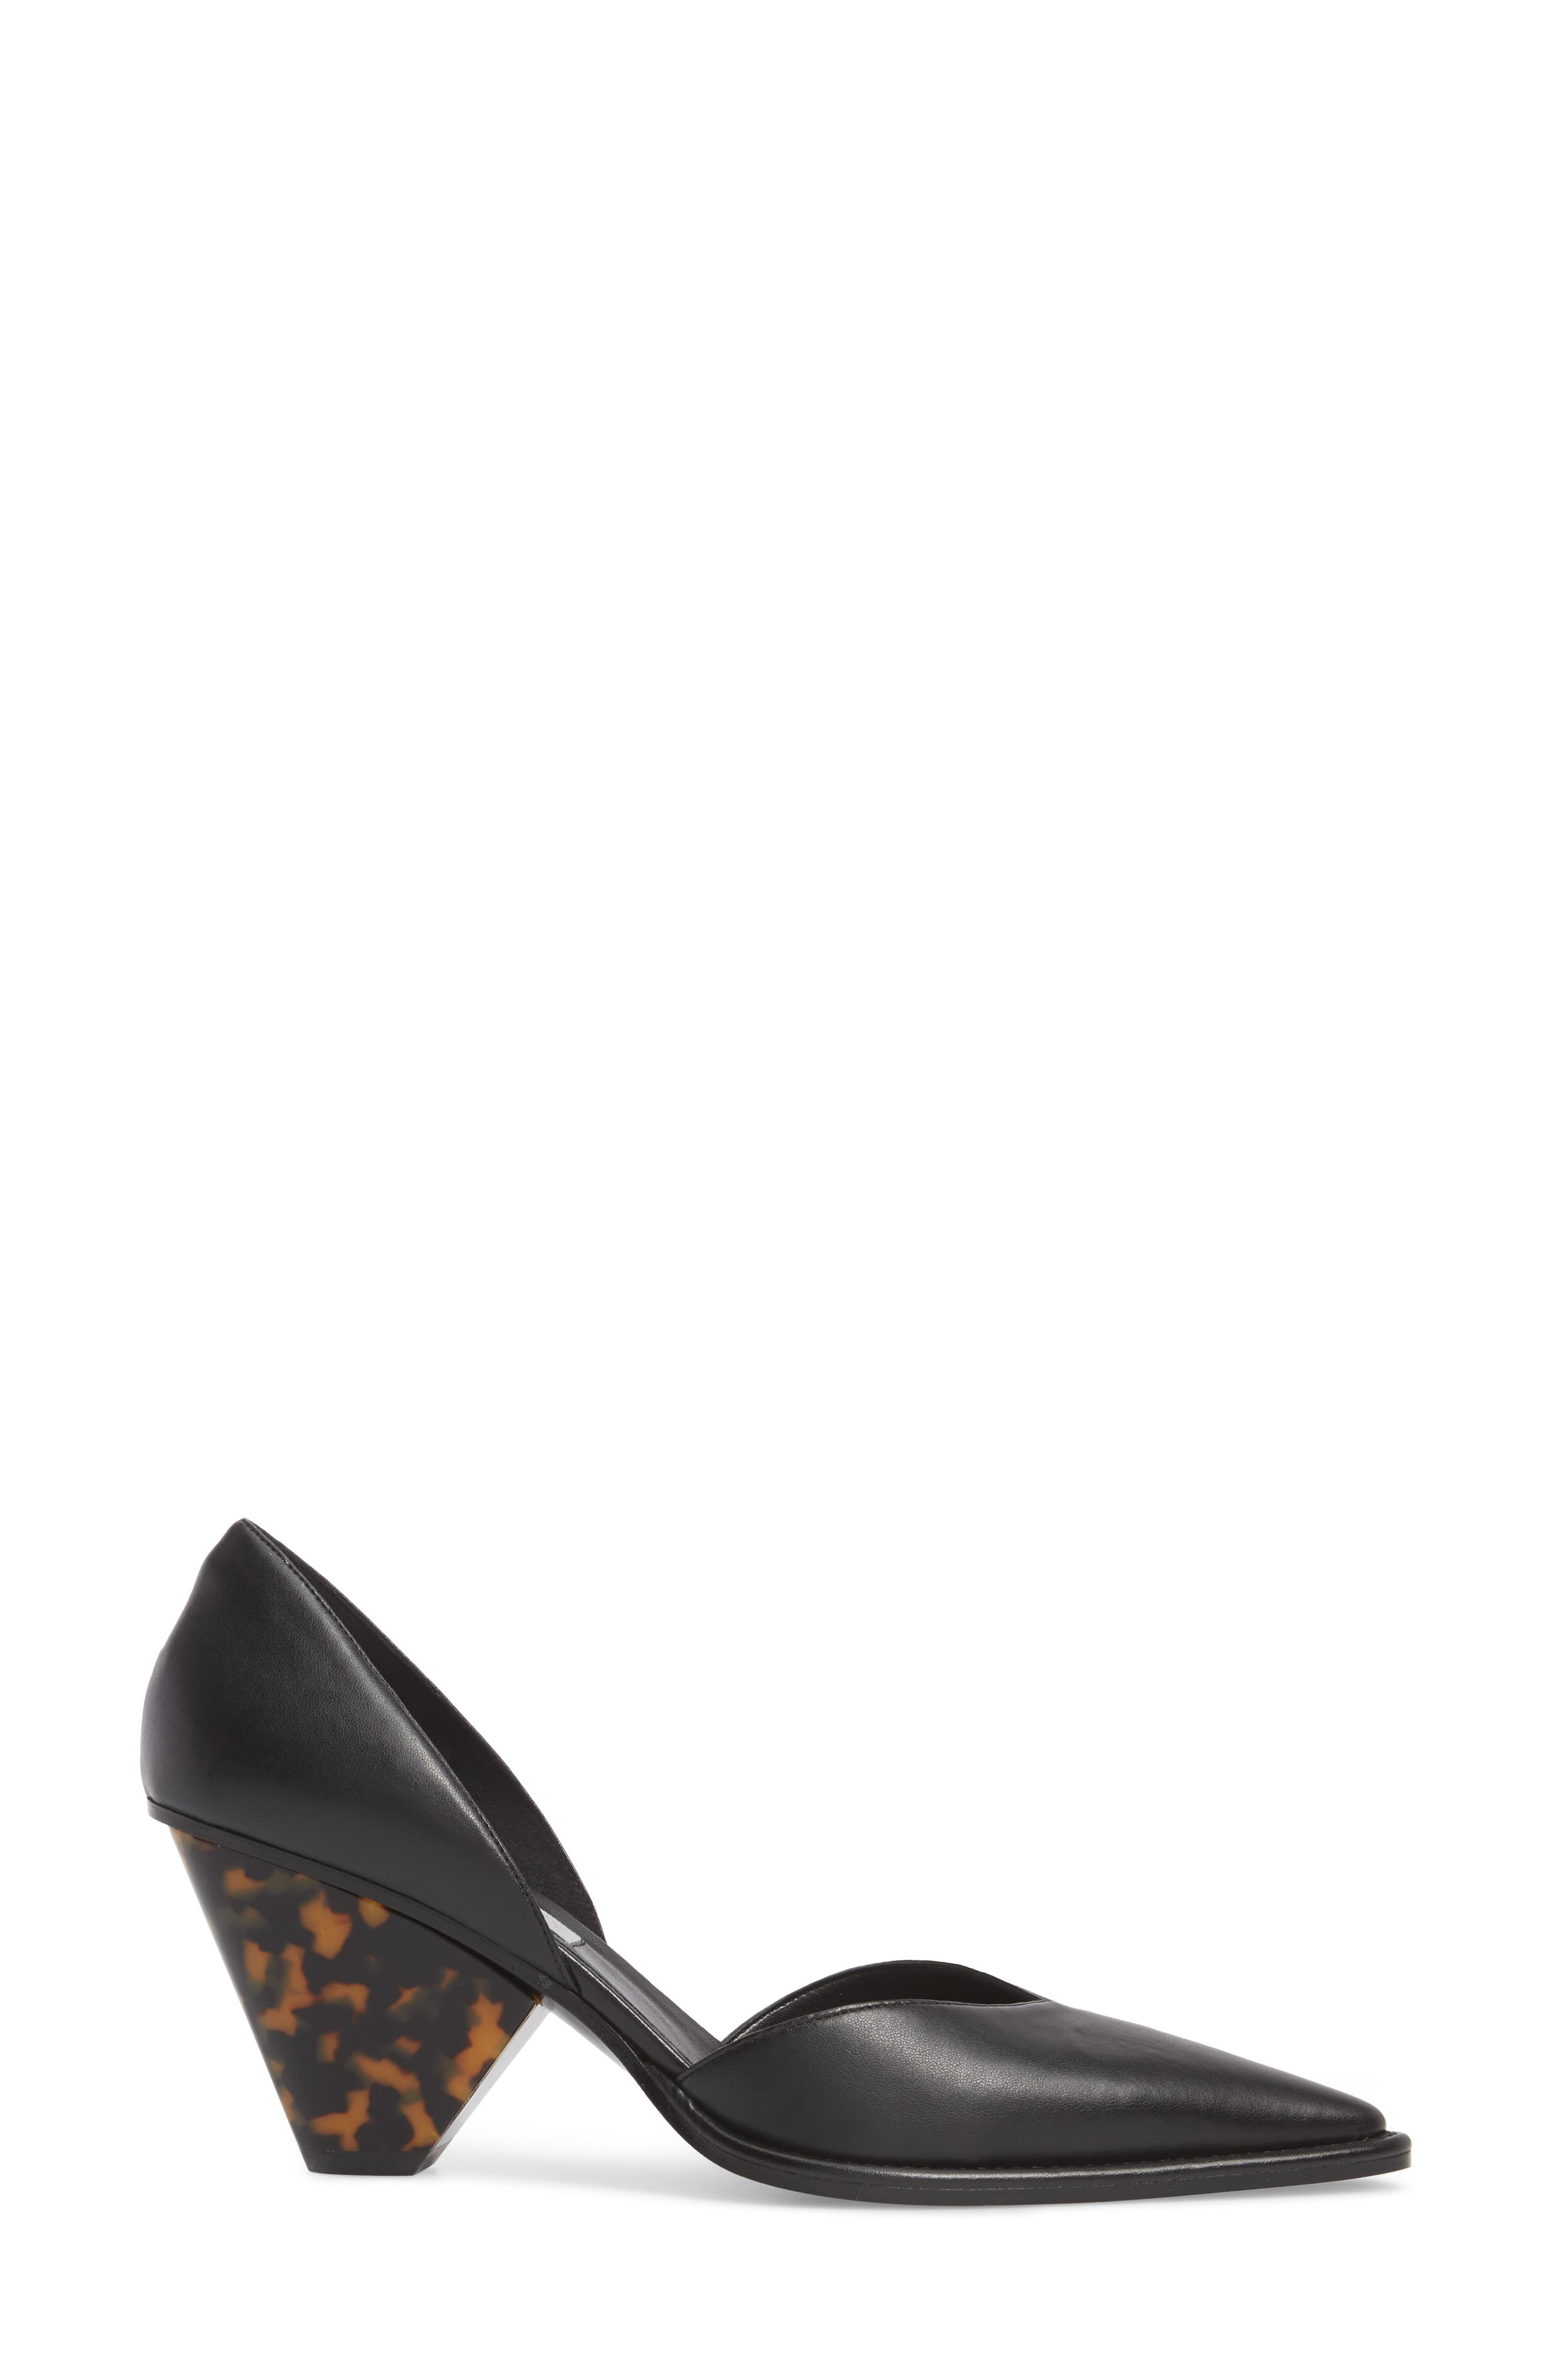 Tortoiseshell Heel d'Orsay Pump,                             Alternate thumbnail 3, color,                             Black